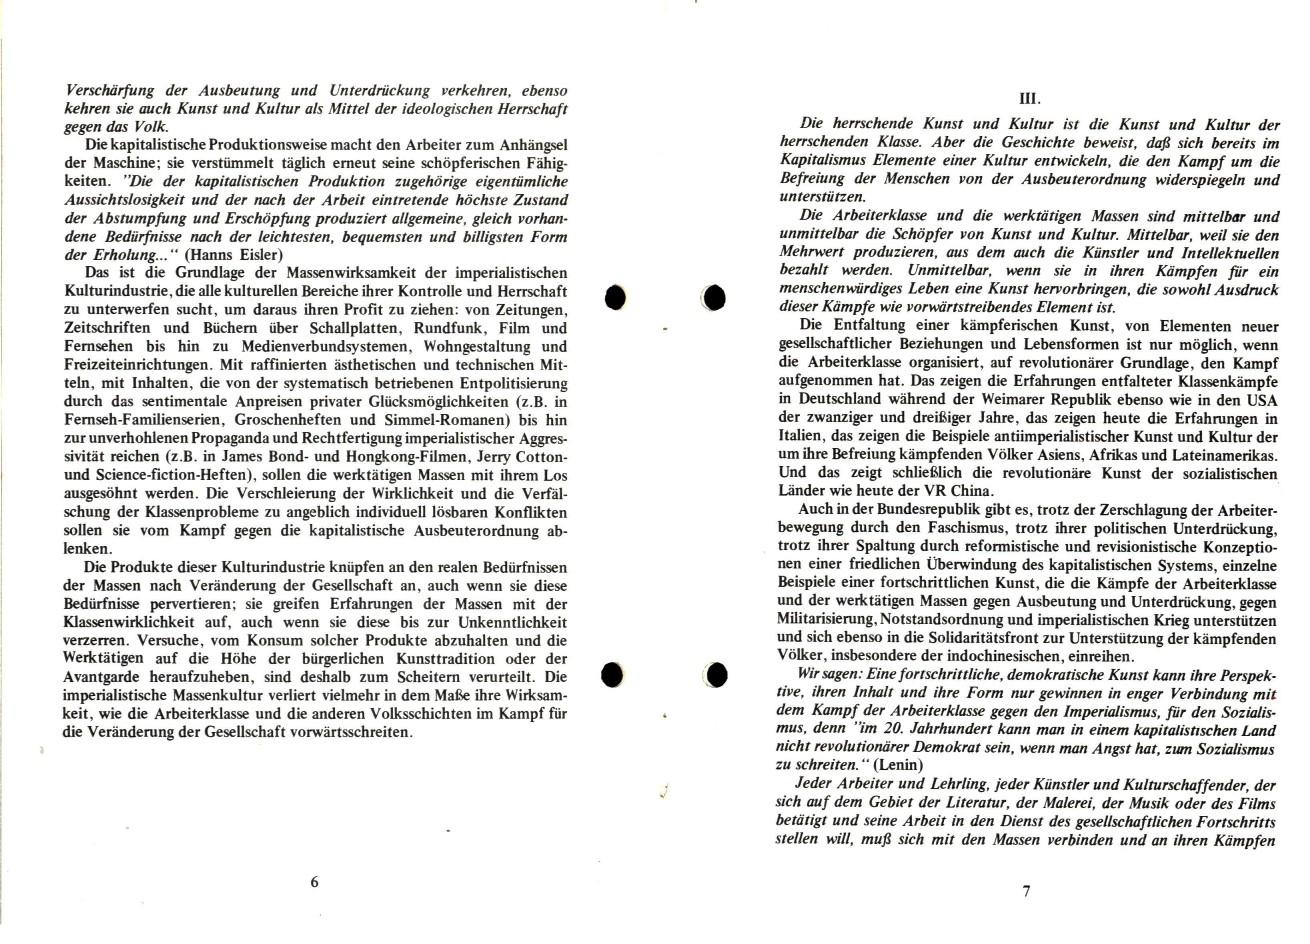 VSK_1974_Manifest_05